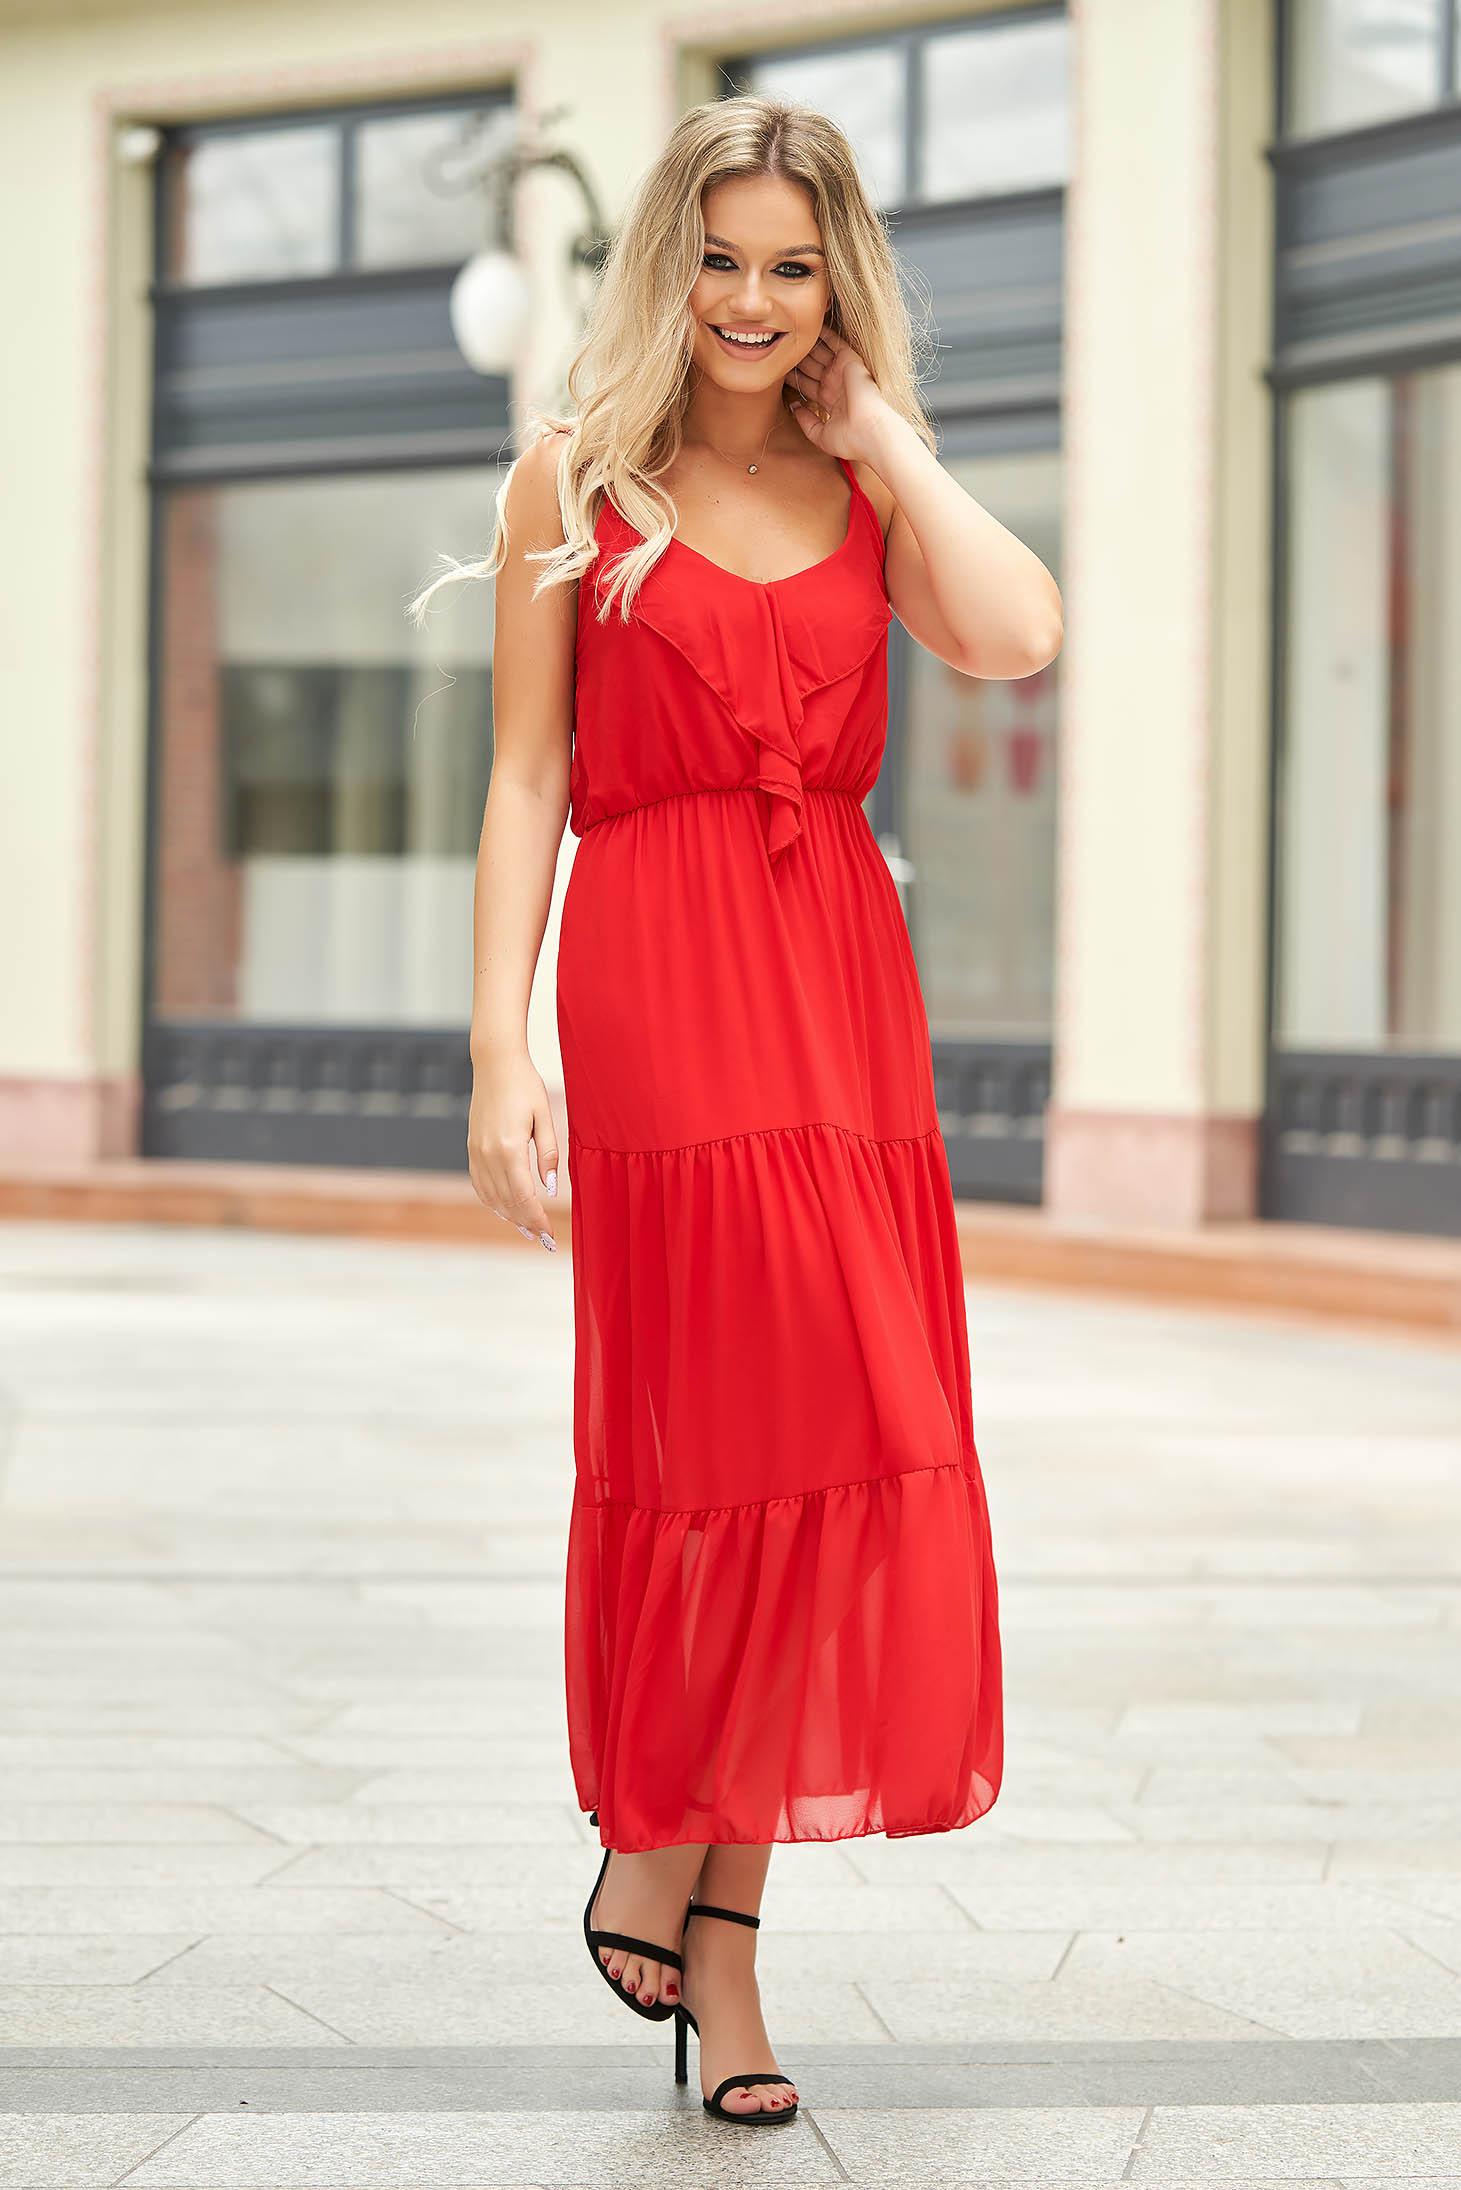 Rochie rosie lunga de zi din voal fara maneci cu volanase